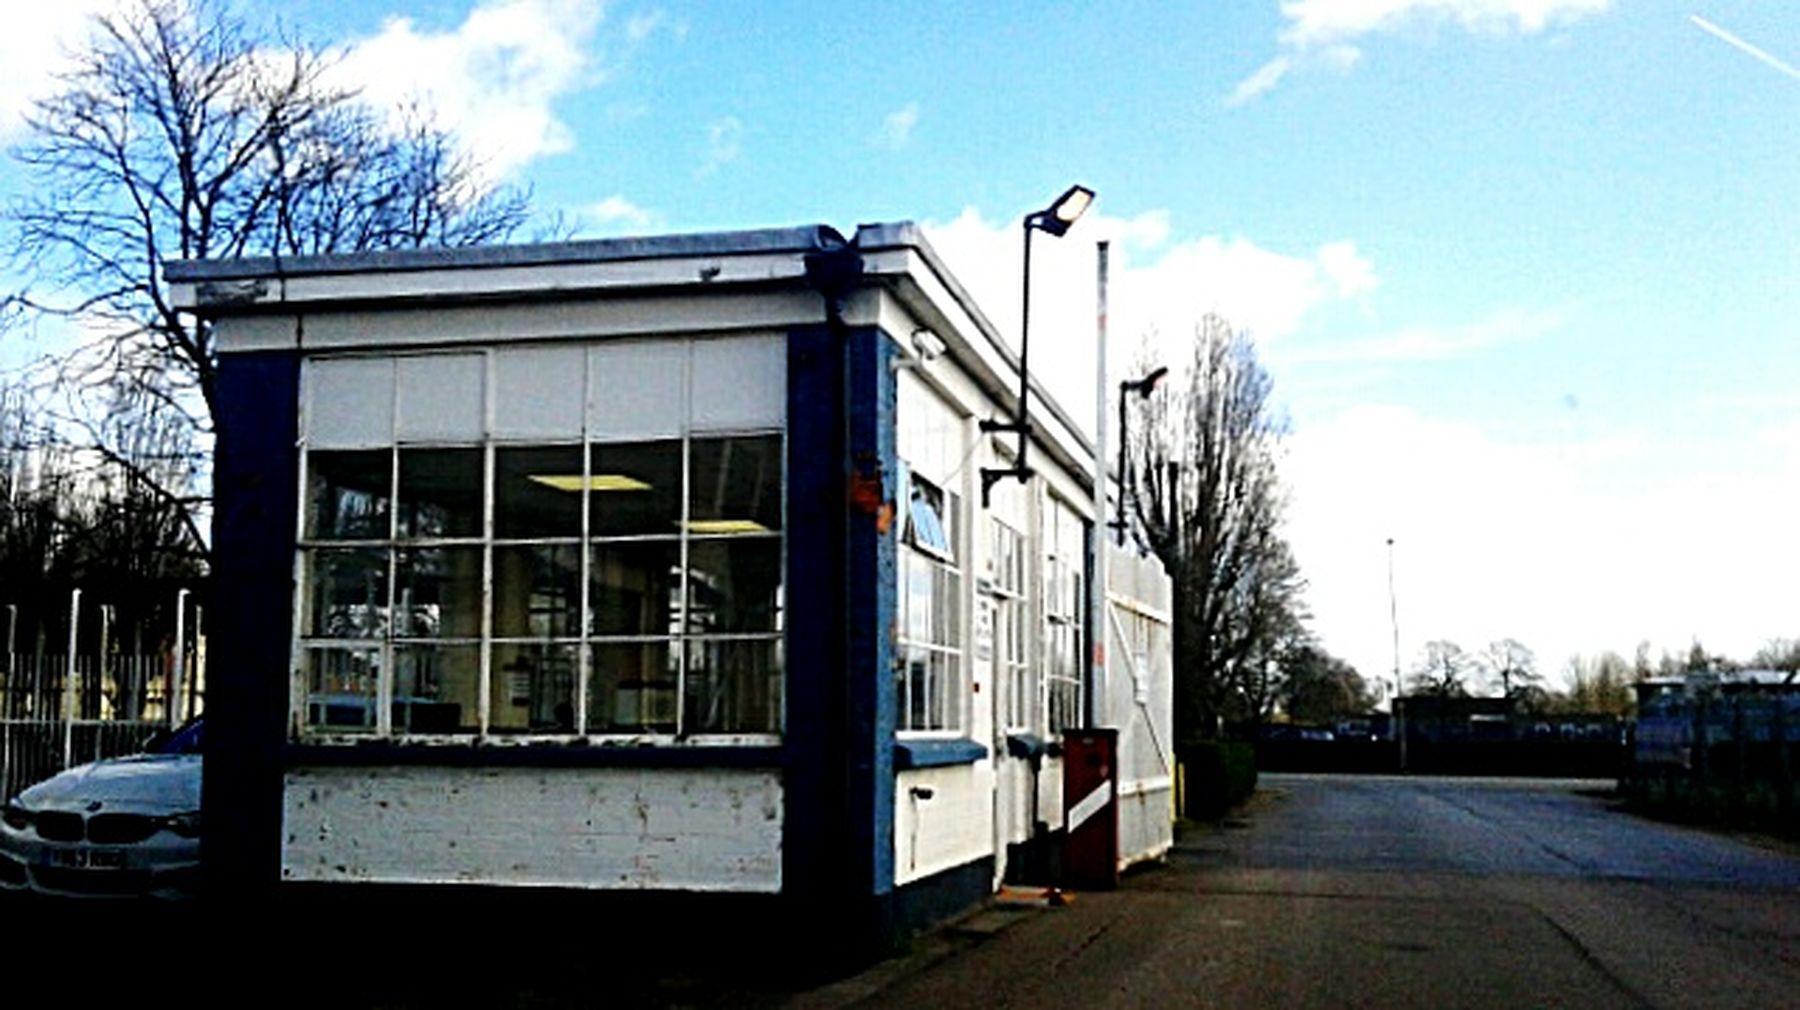 Bata Shoefactory Tilbury Essex